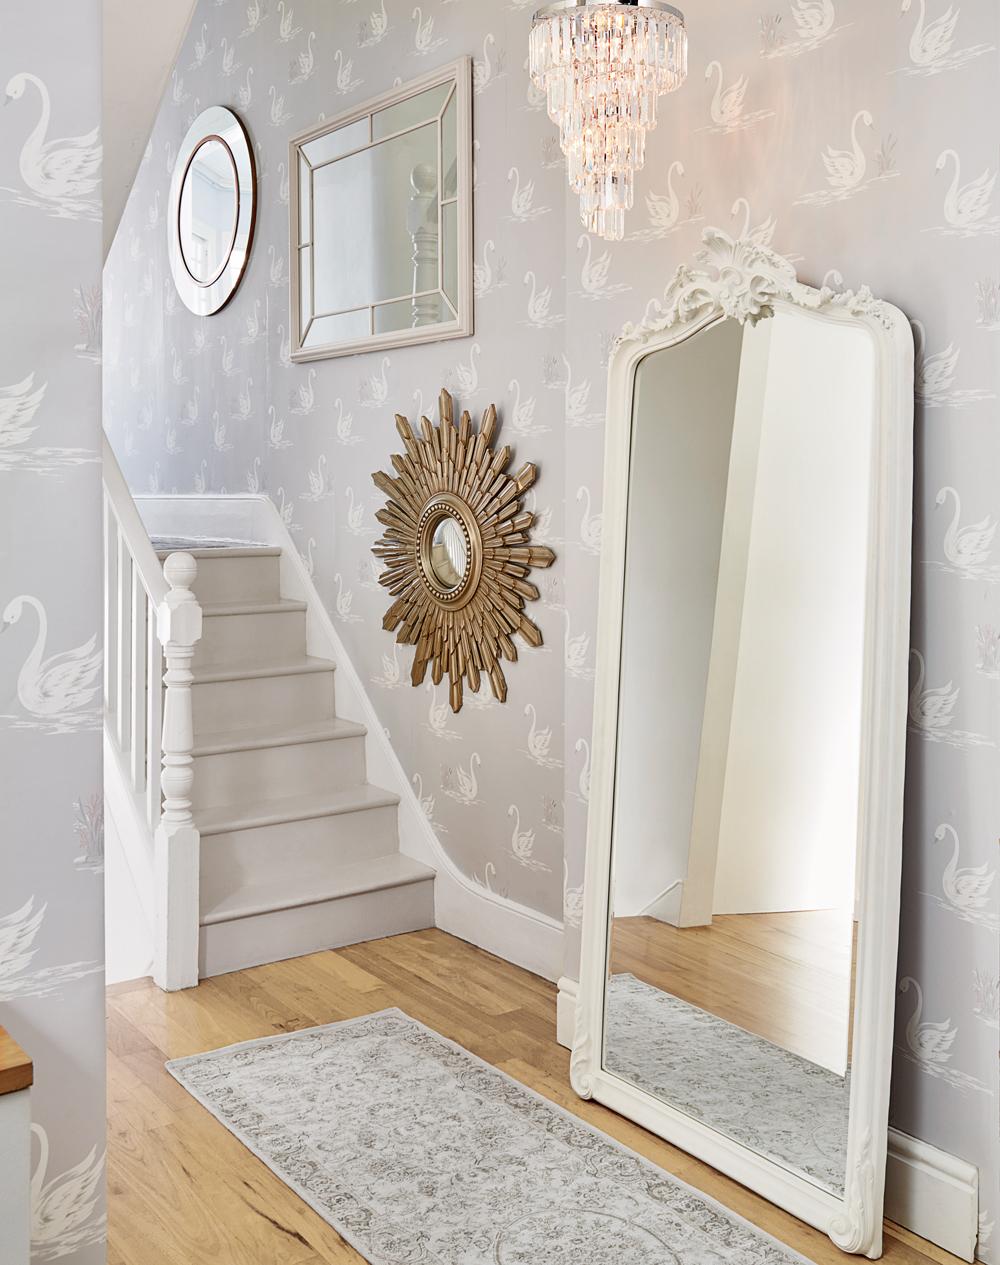 Laura-Ashley-AW-interiors-SilverSerenity-SilverSwans-wallpaper-wp5208670